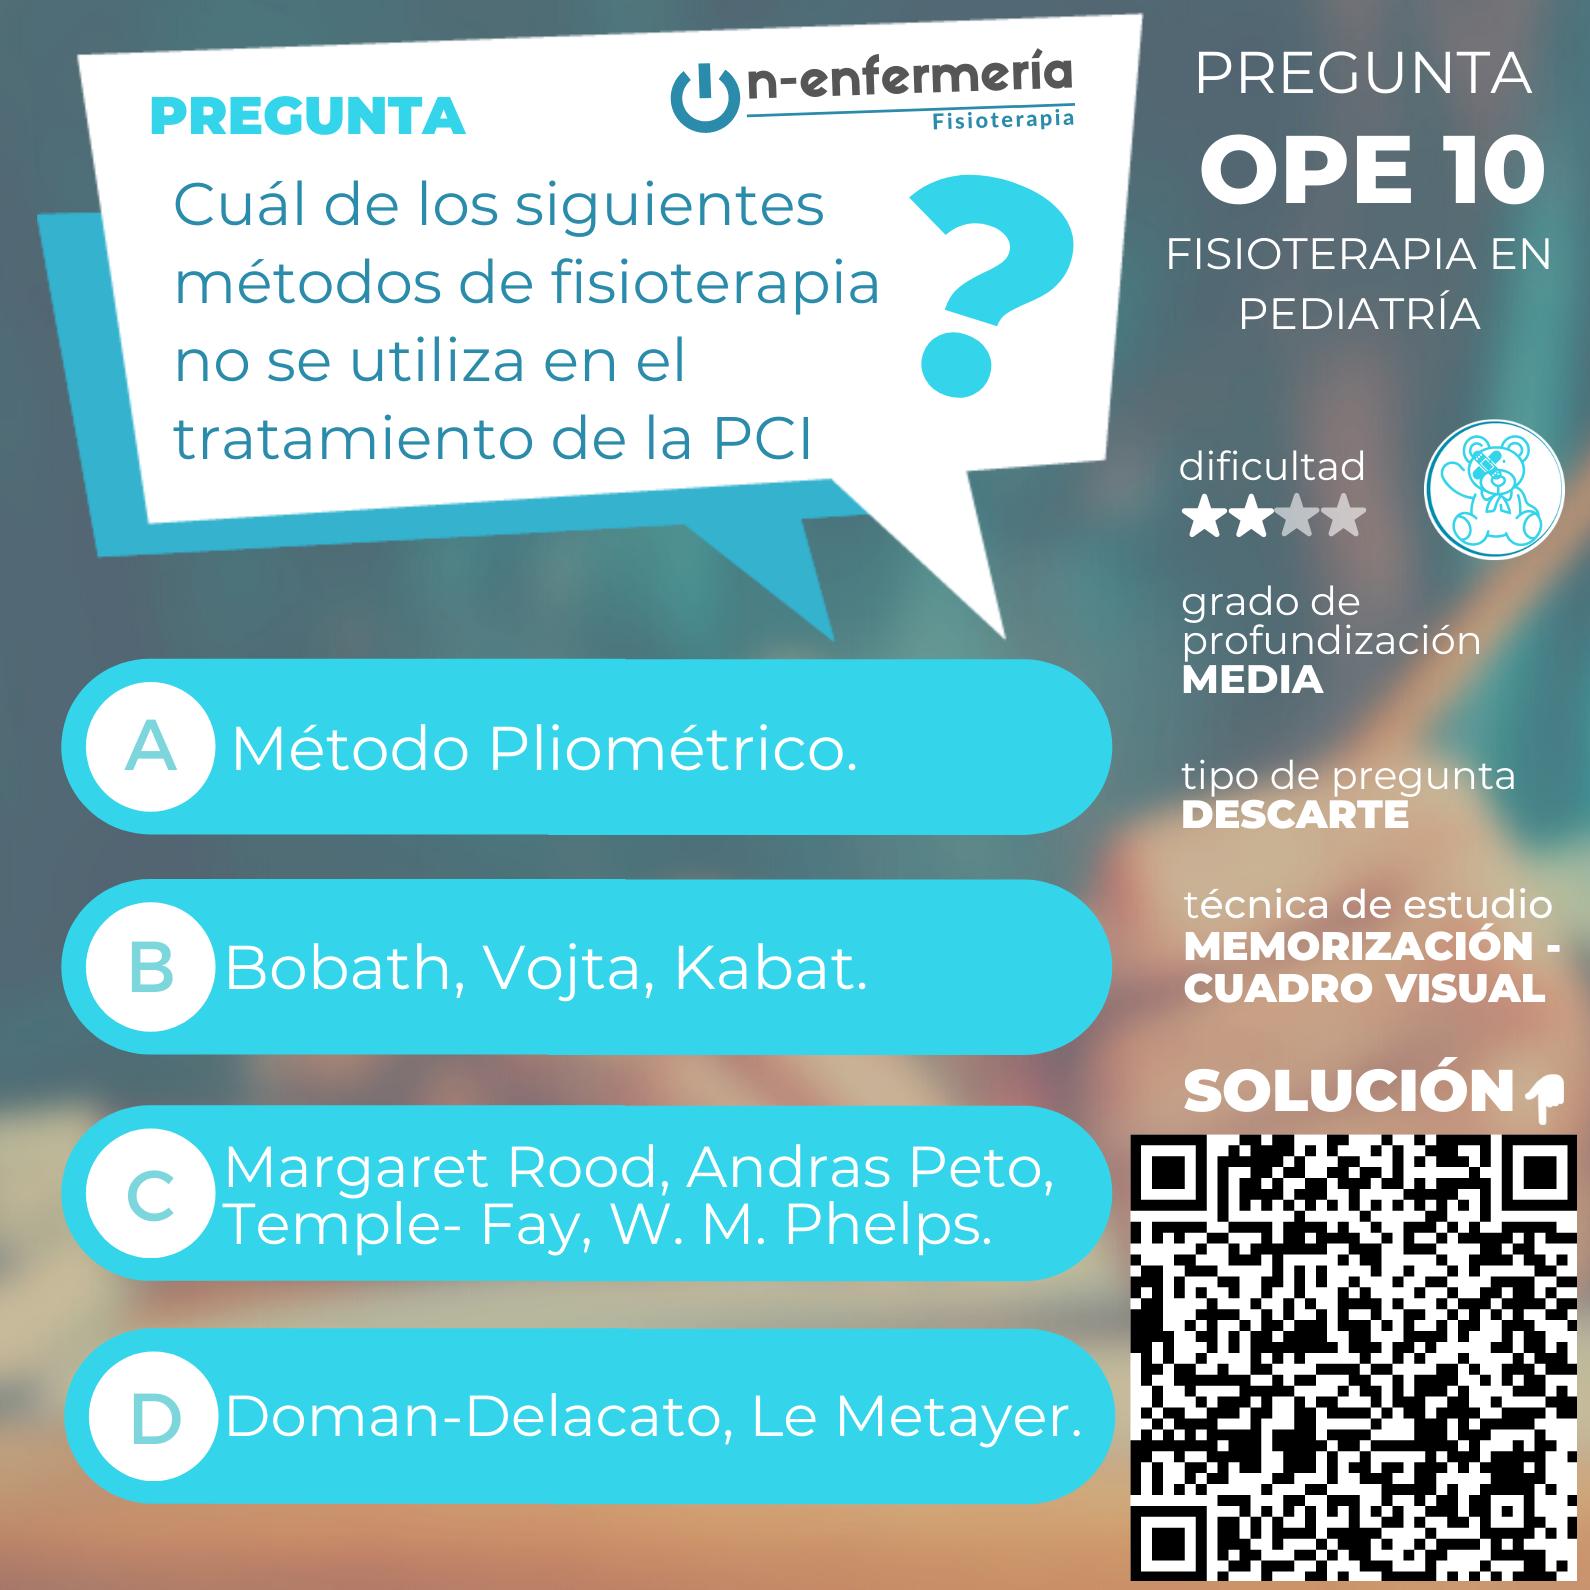 Pregunta nº 10 examen OPE Fisioterapia - Fisioterapia en Pediatría